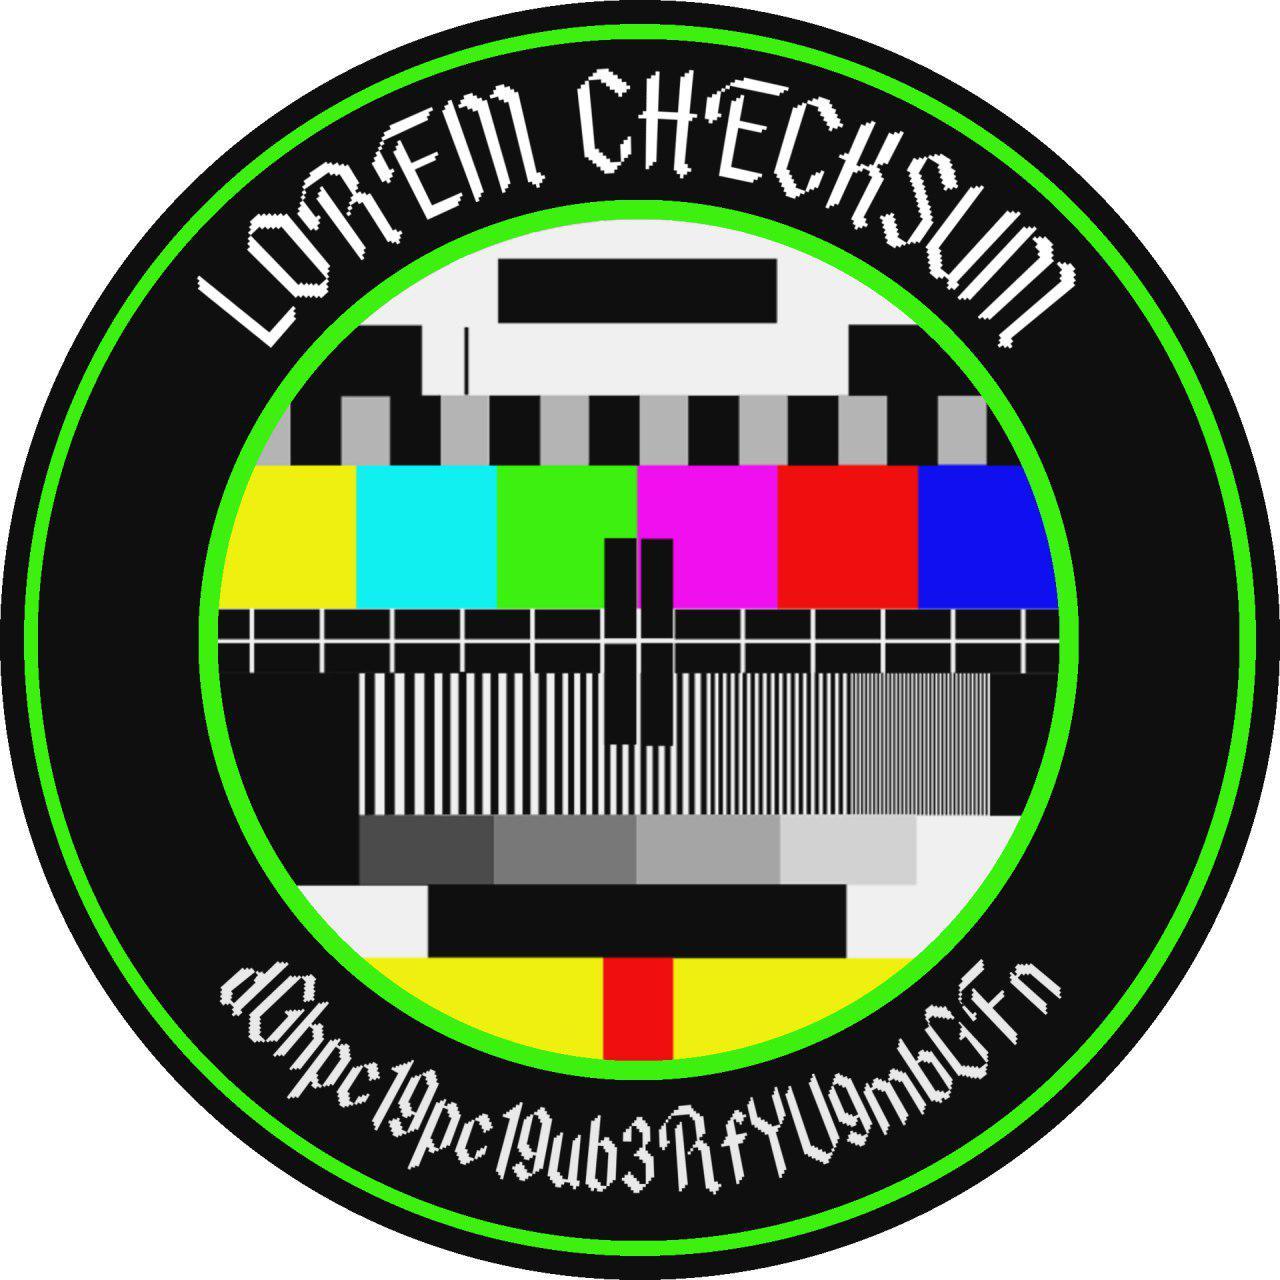 CTFtime org / Lorem Checksum